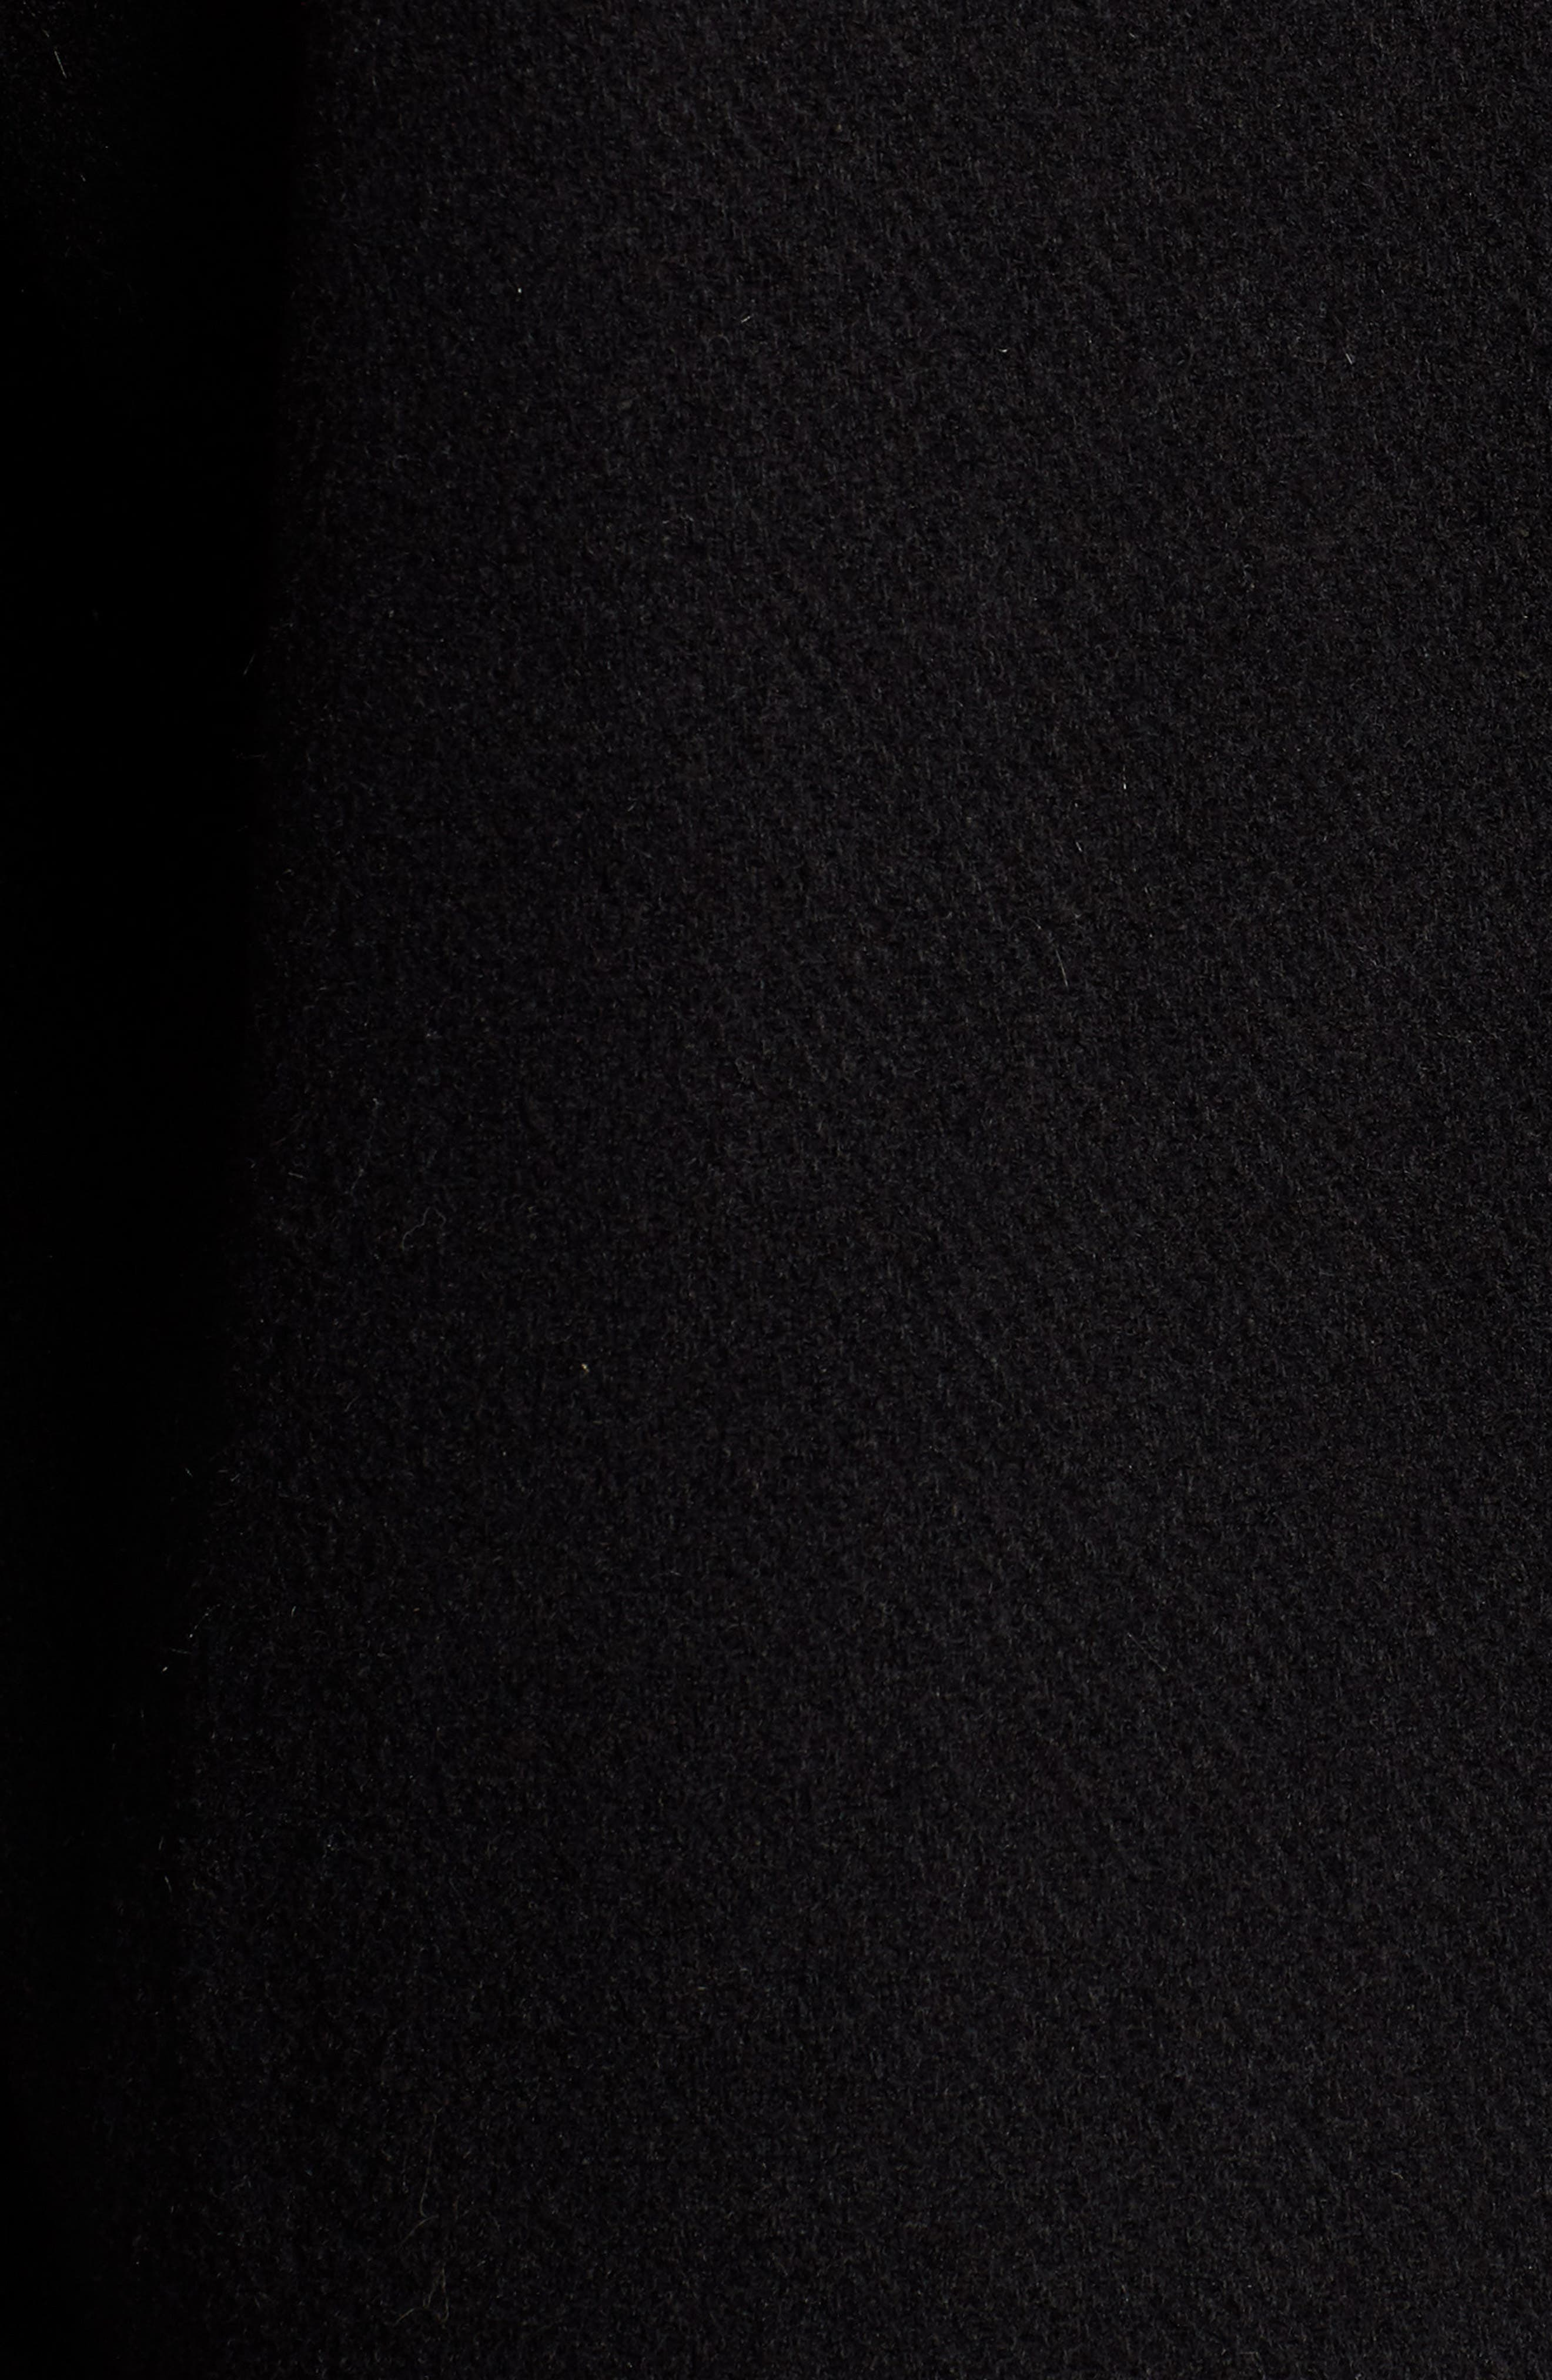 Faux Fur Panel Wool Blend Coat,                             Alternate thumbnail 7, color,                             BLACK